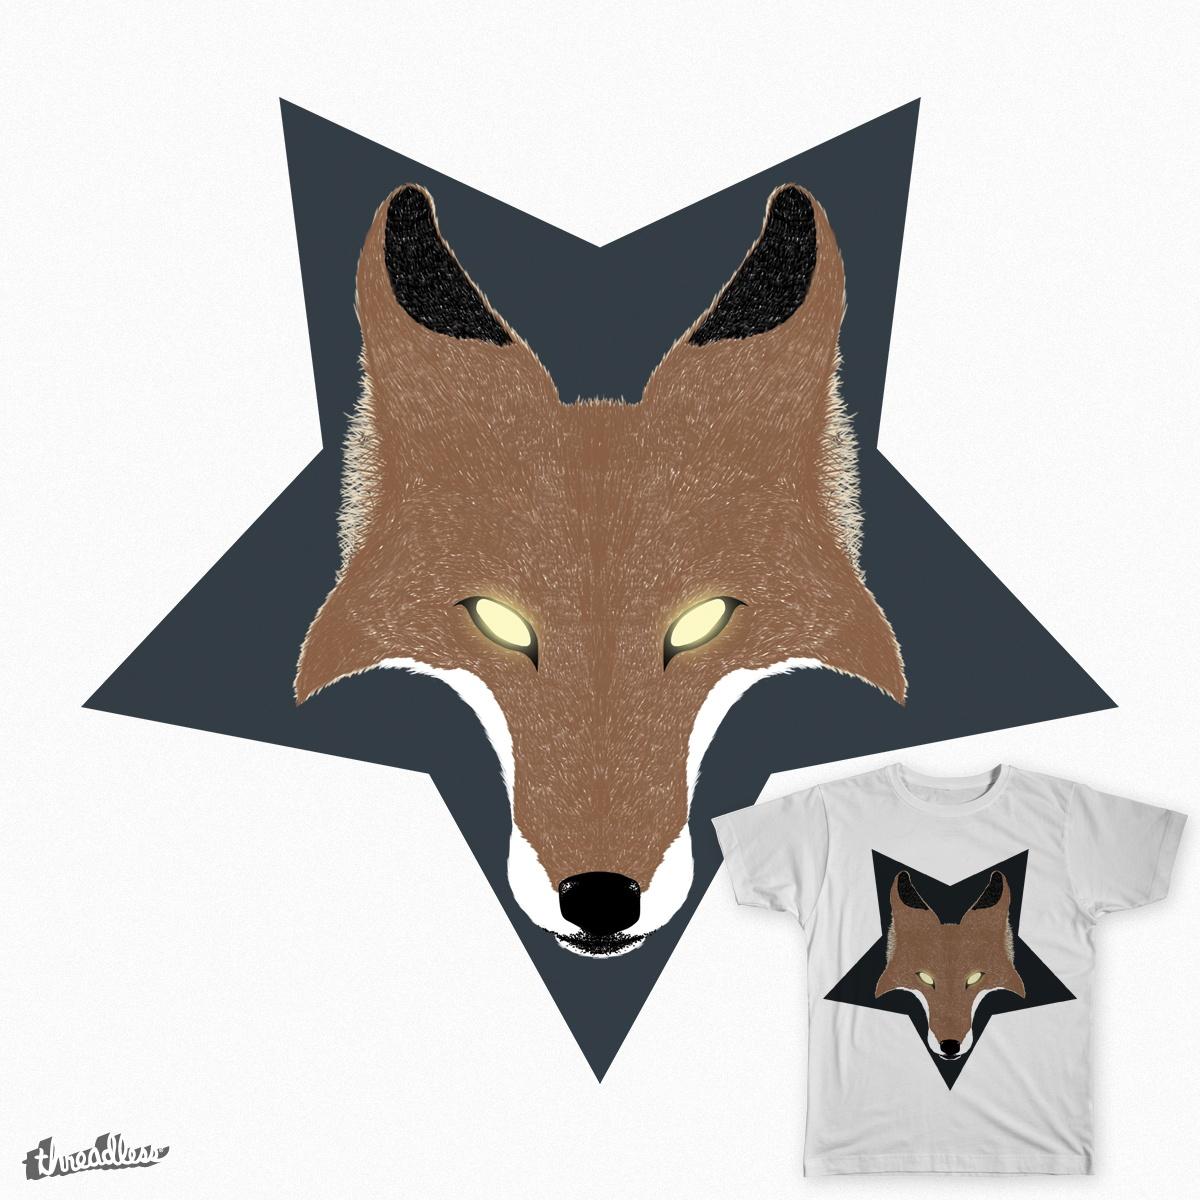 StarFox by gabrielhardt on Threadless